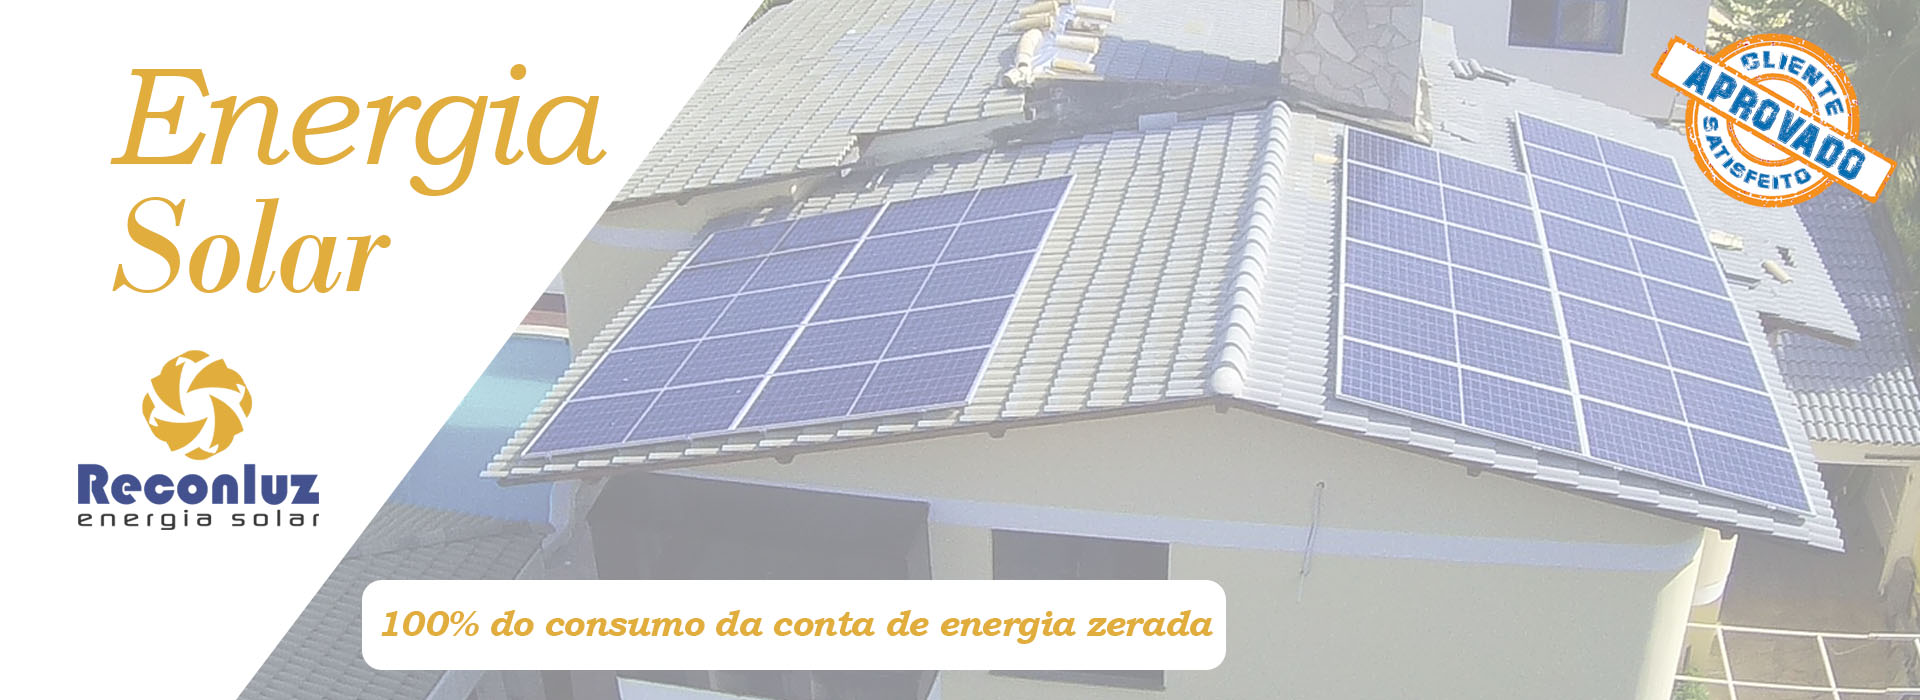 Energia Solar - Reconluz Salvador Bahia